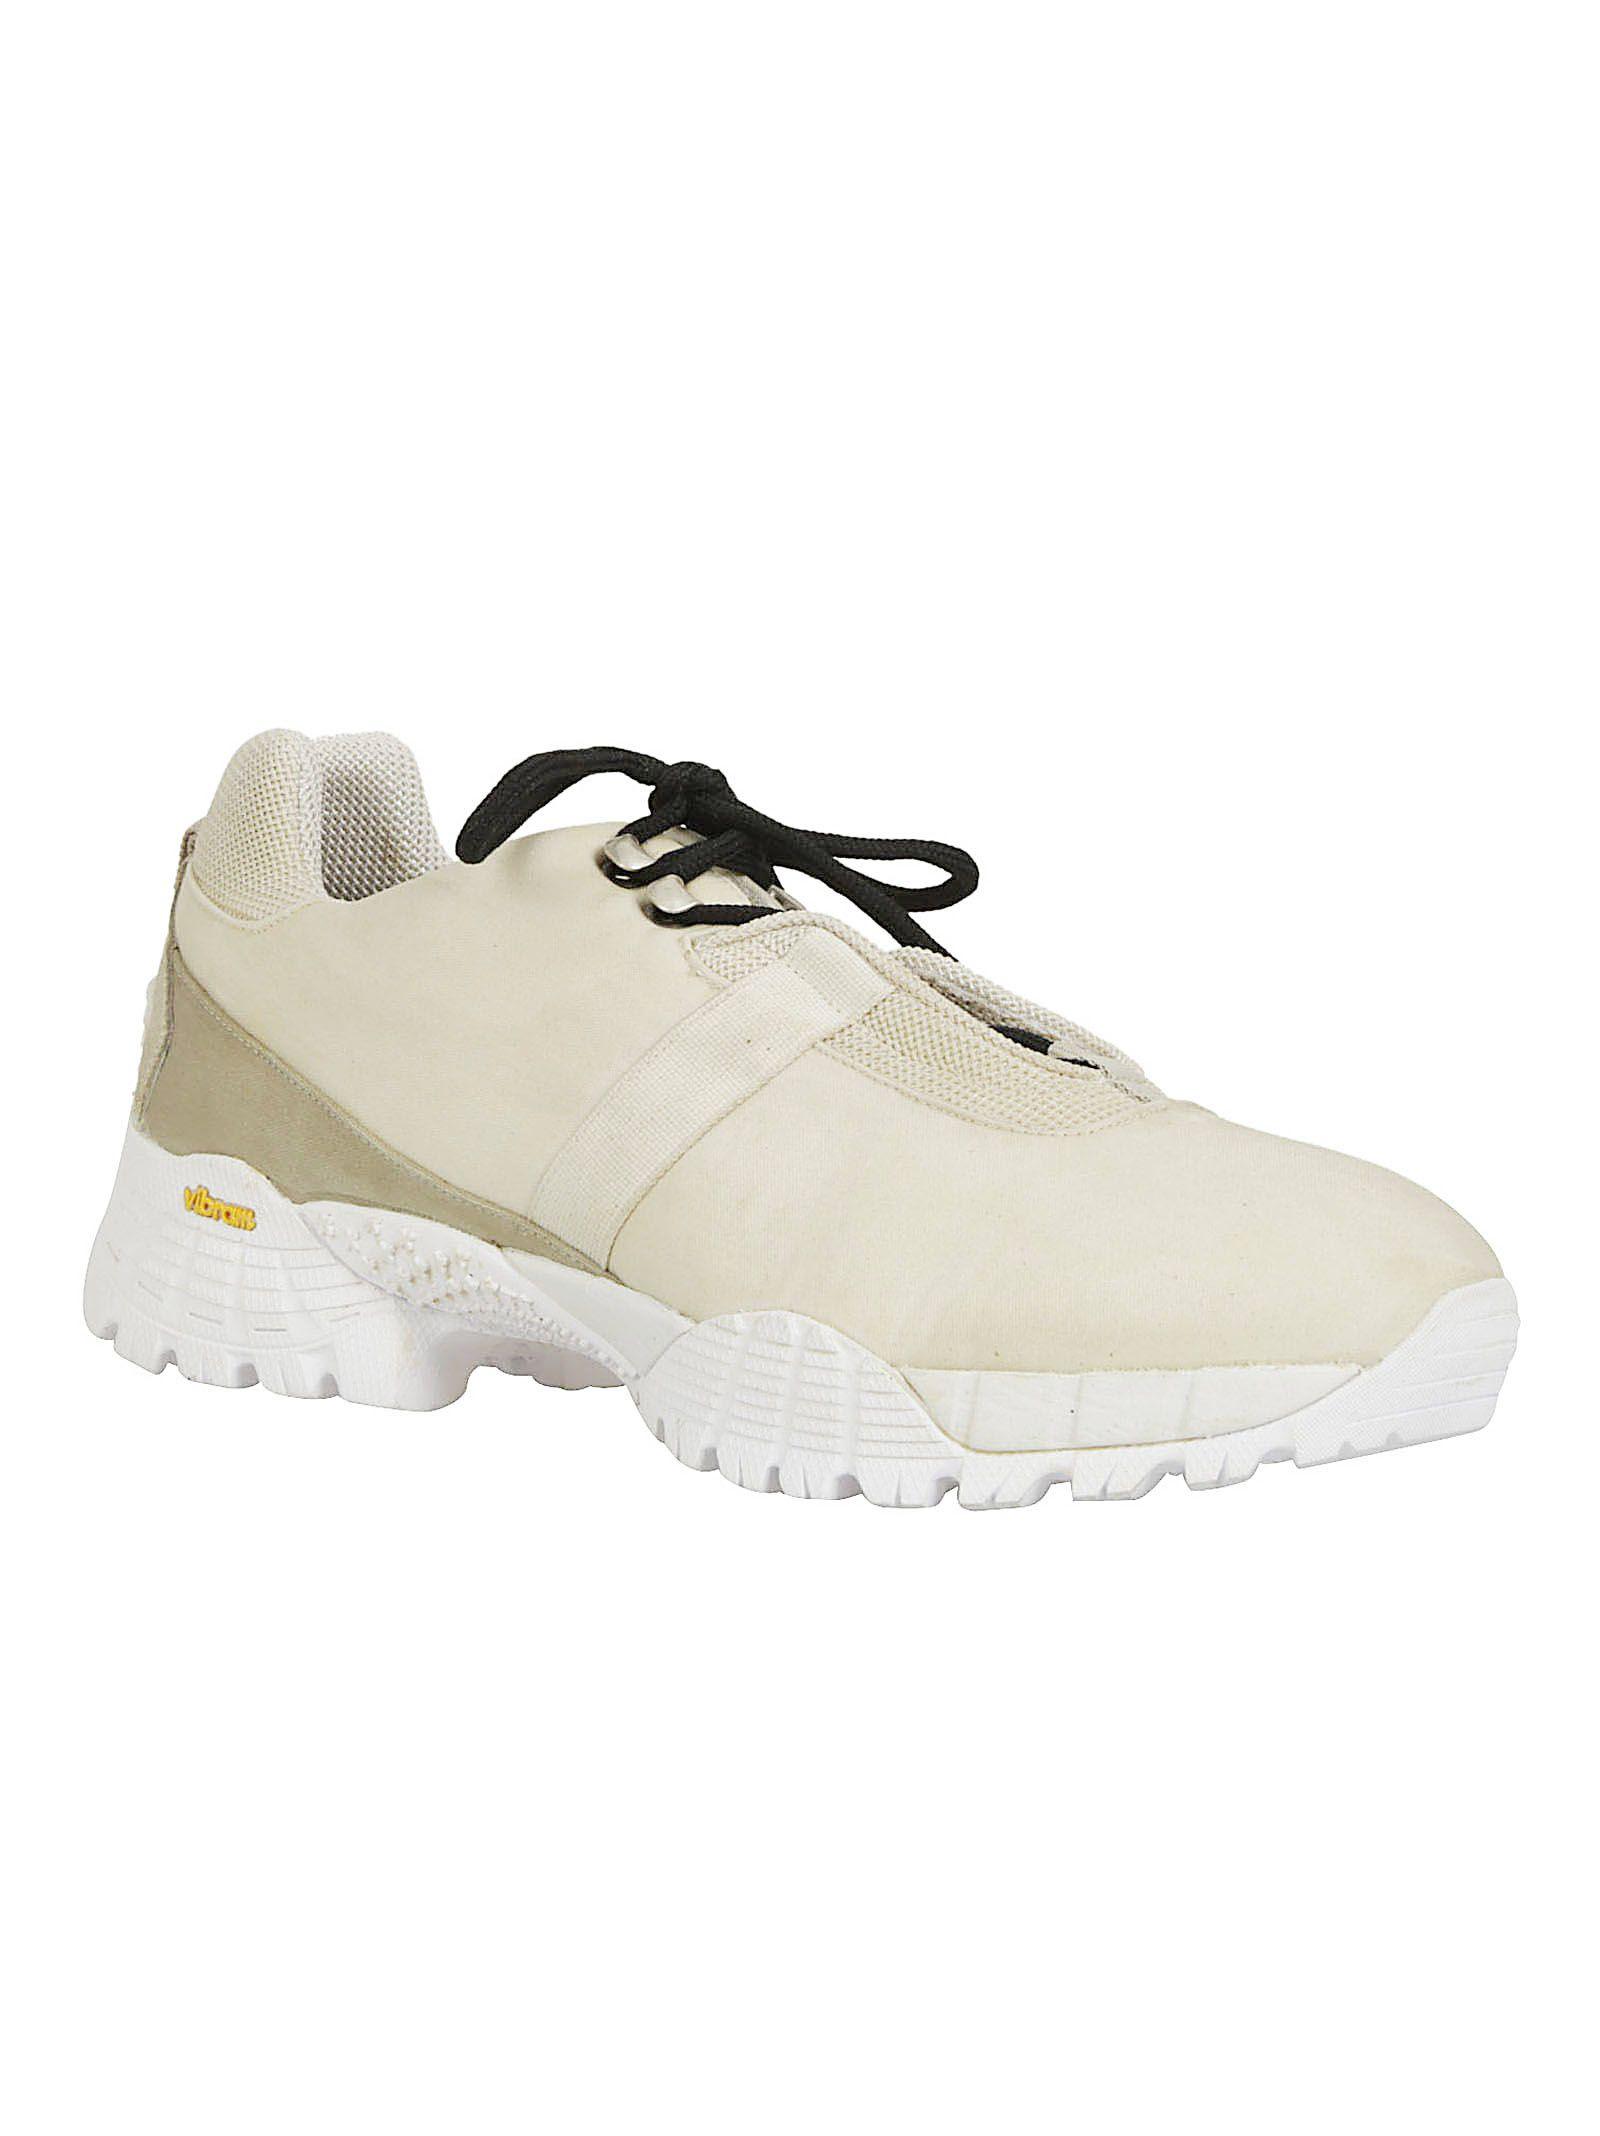 runner sneakers - Nude & Neutrals Alyx 2aijZQW7d